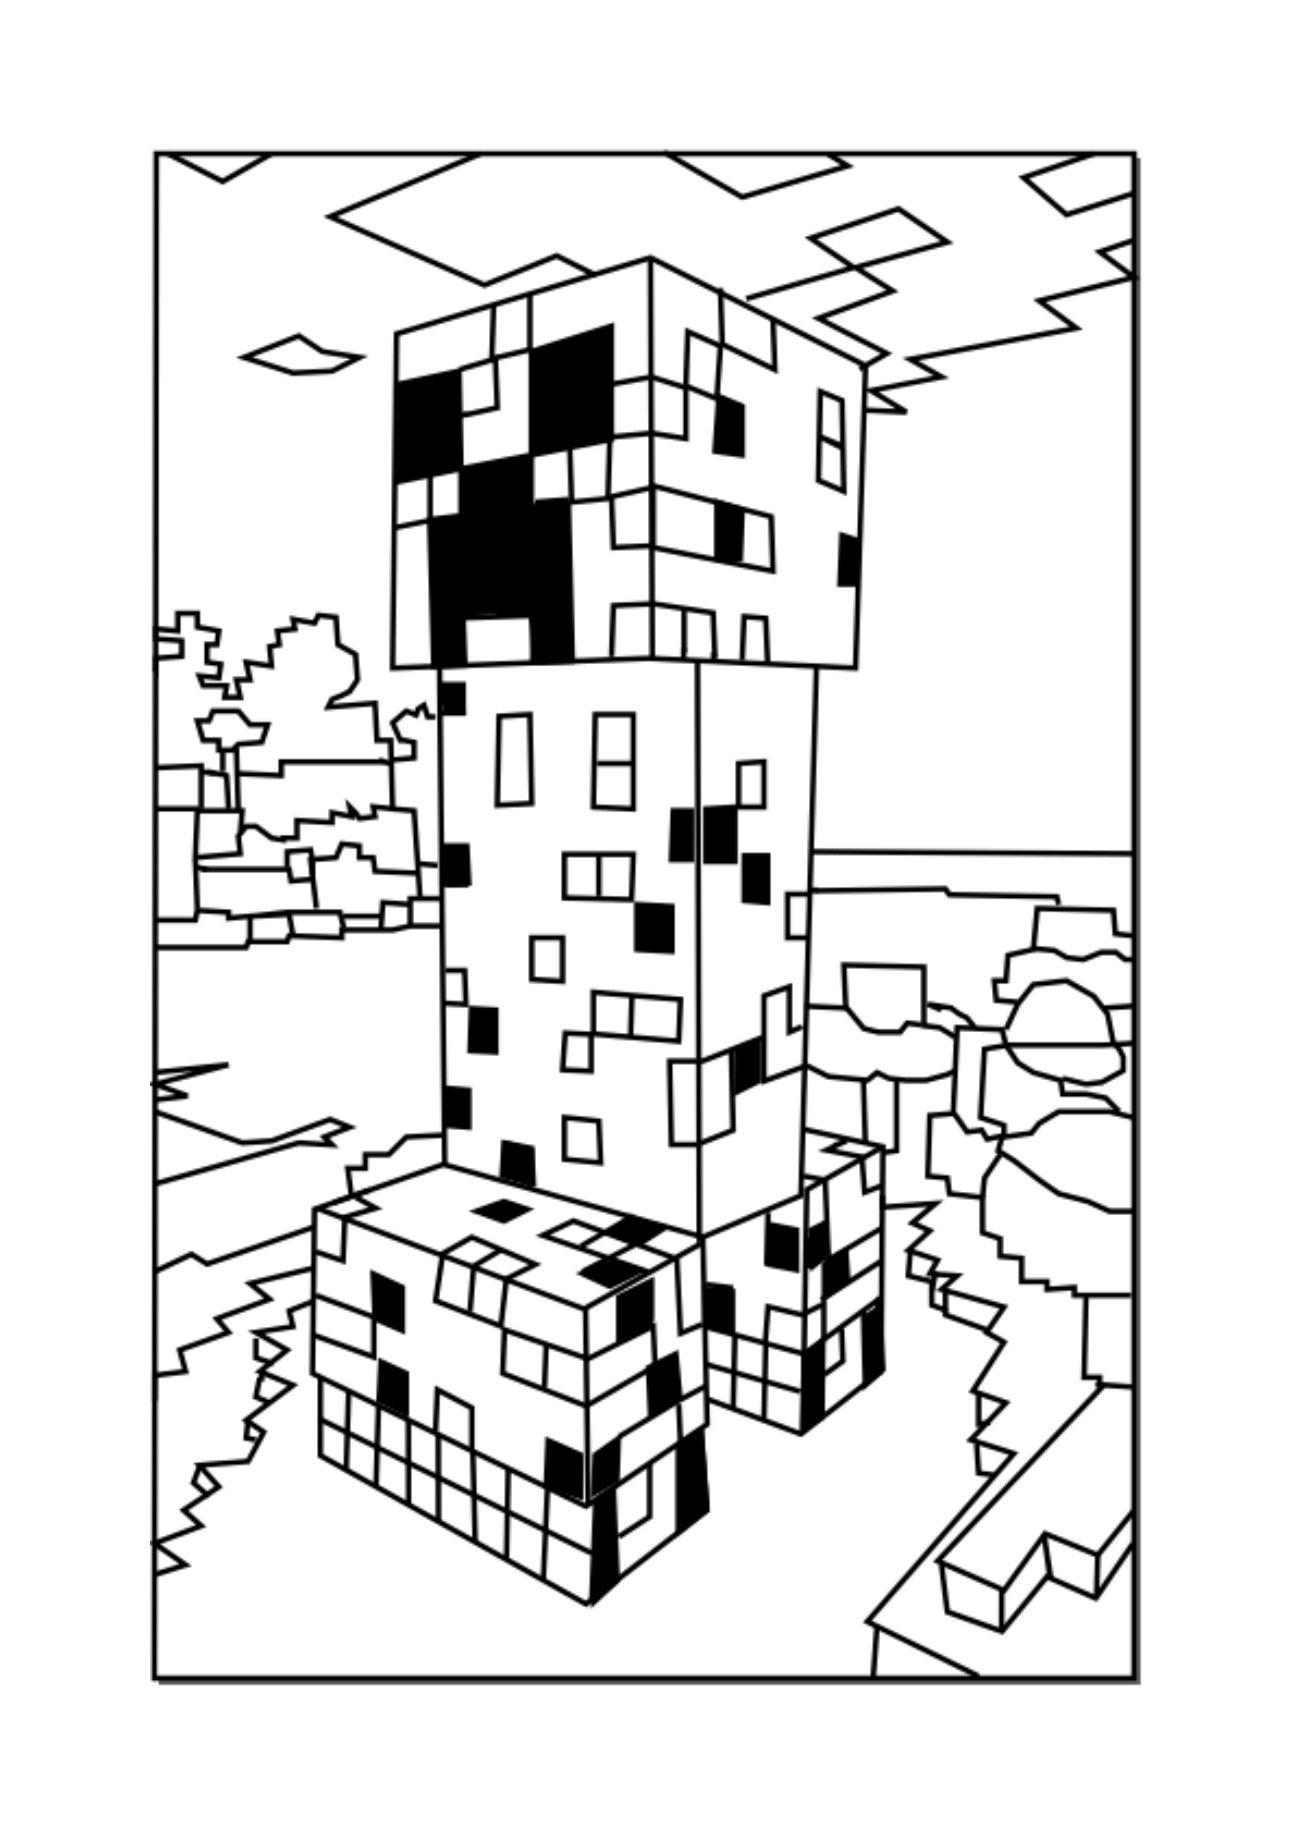 Minecraft Creeper Coloring Page Minecraft Coloring Pages Coloring Pages Free Coloring Pages